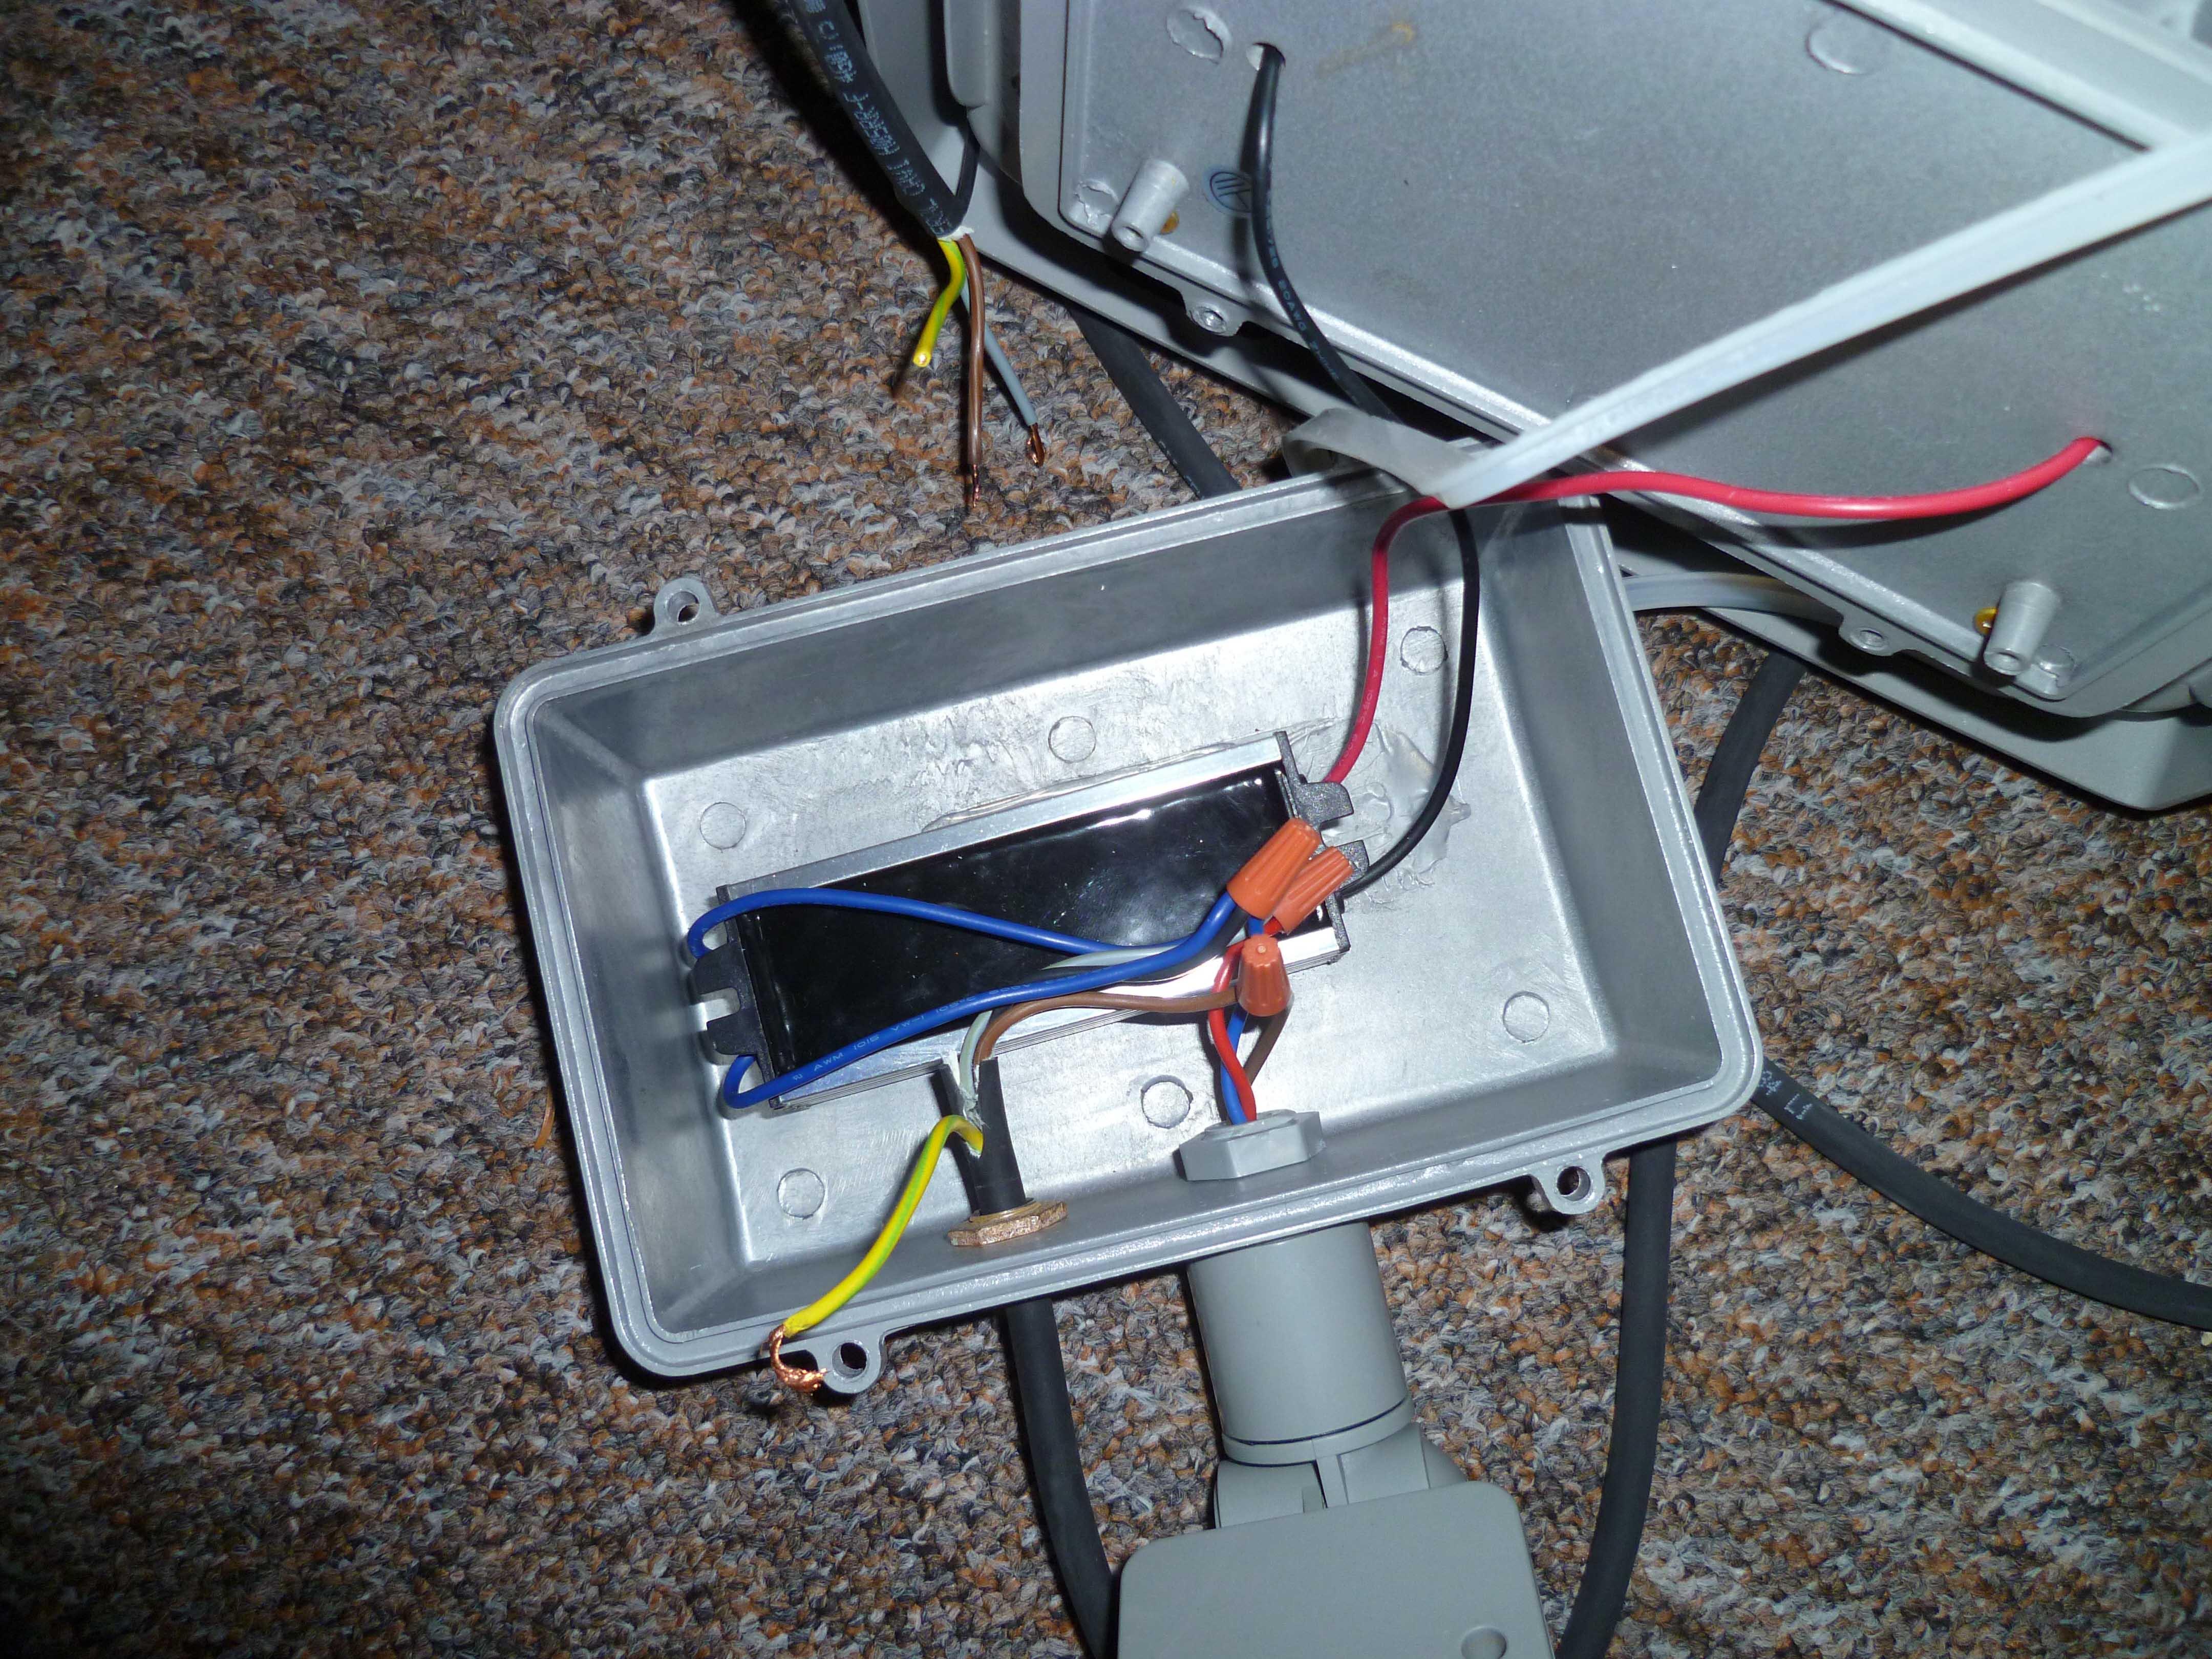 led flutlicht eingebauten bewegungsmelder berbr cken f r dauerschaltung umgehen sensor. Black Bedroom Furniture Sets. Home Design Ideas